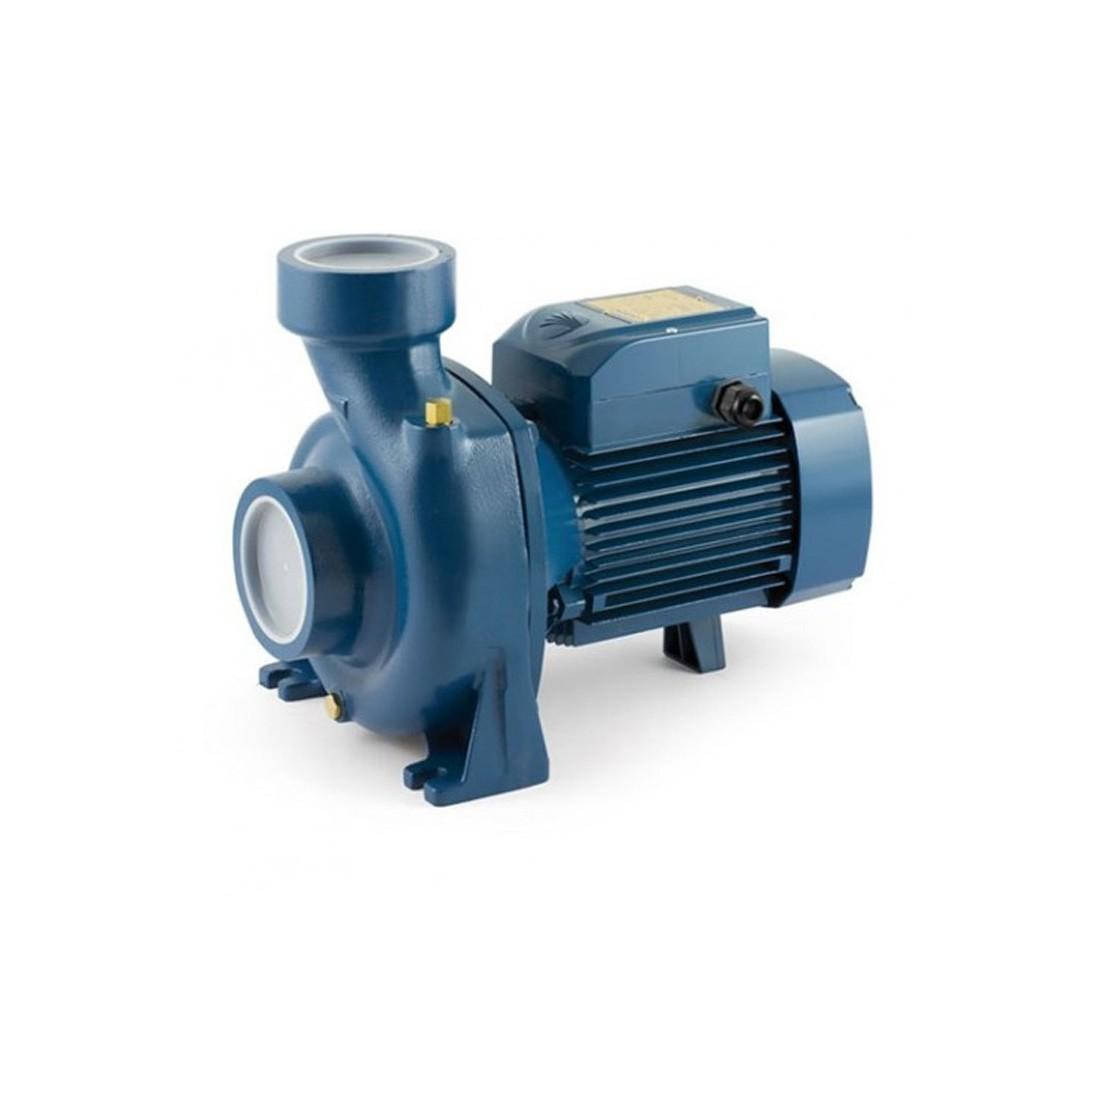 Pompa de suprafata centrifugala Pedrollo HFm 4 monofazata